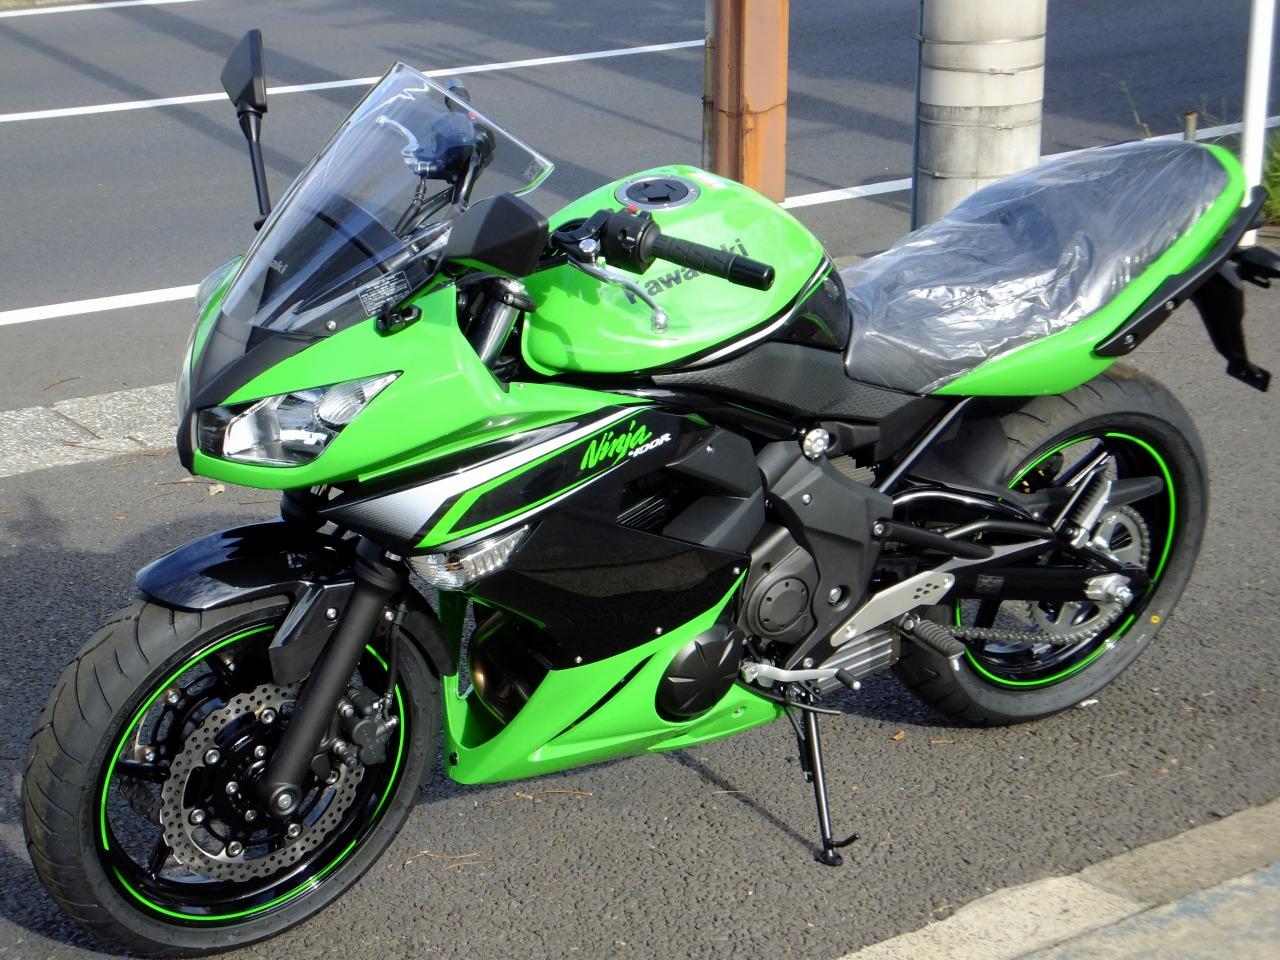 Kawasaki Ninja 400r максимальная скорость #10